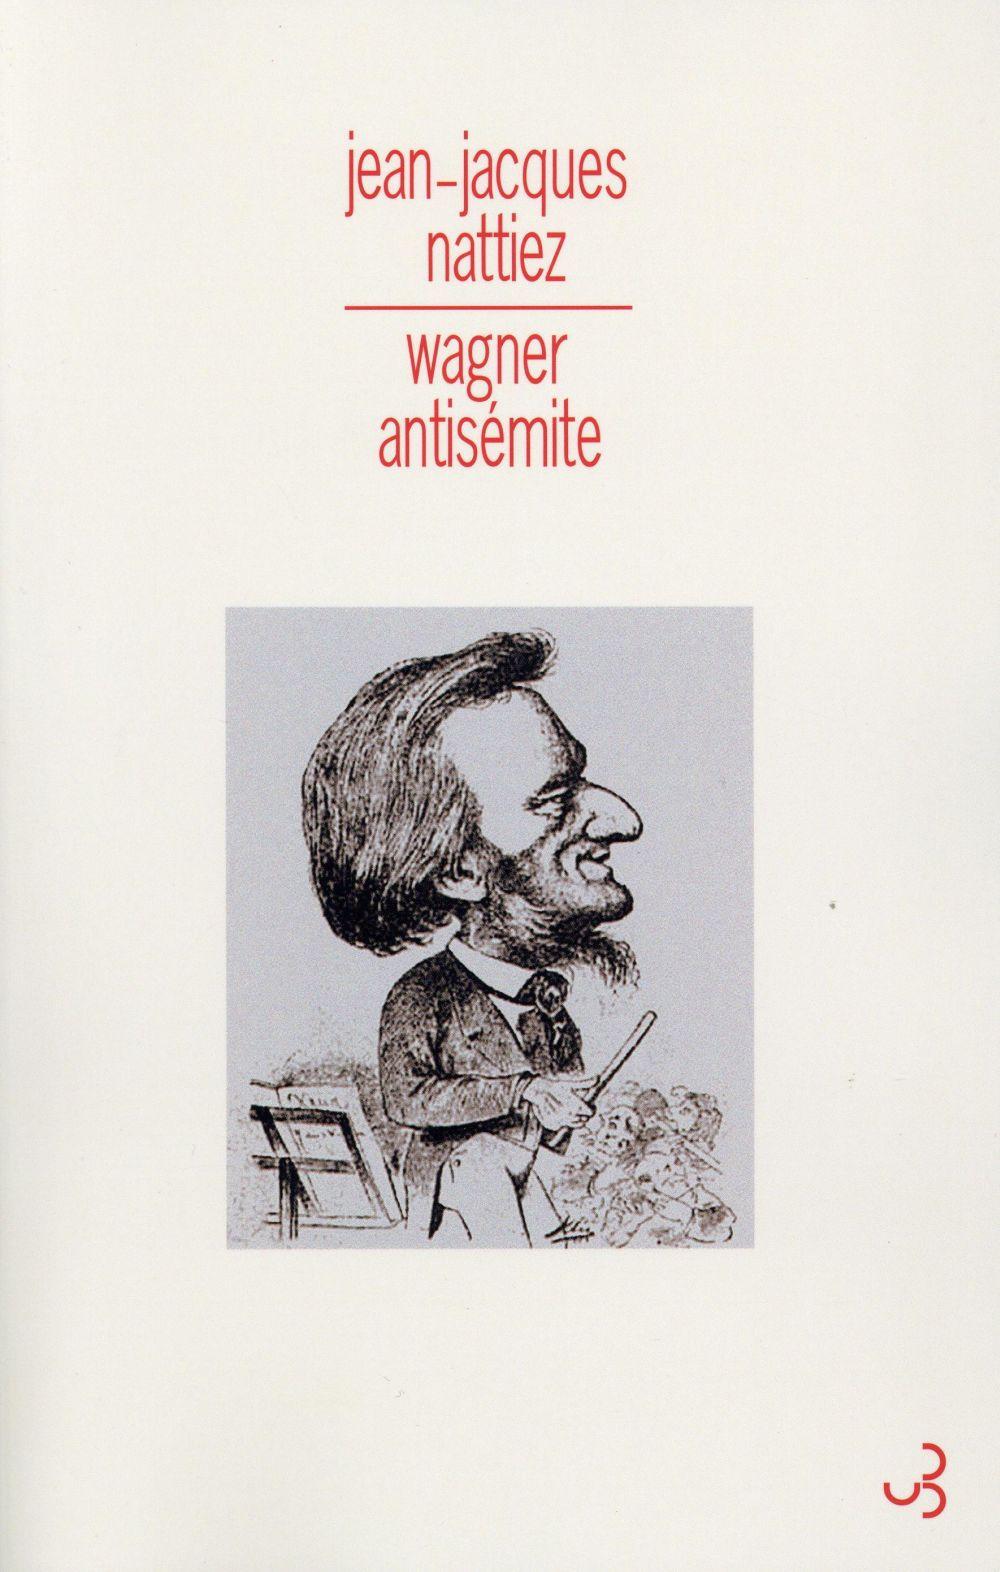 Wagner antisémite